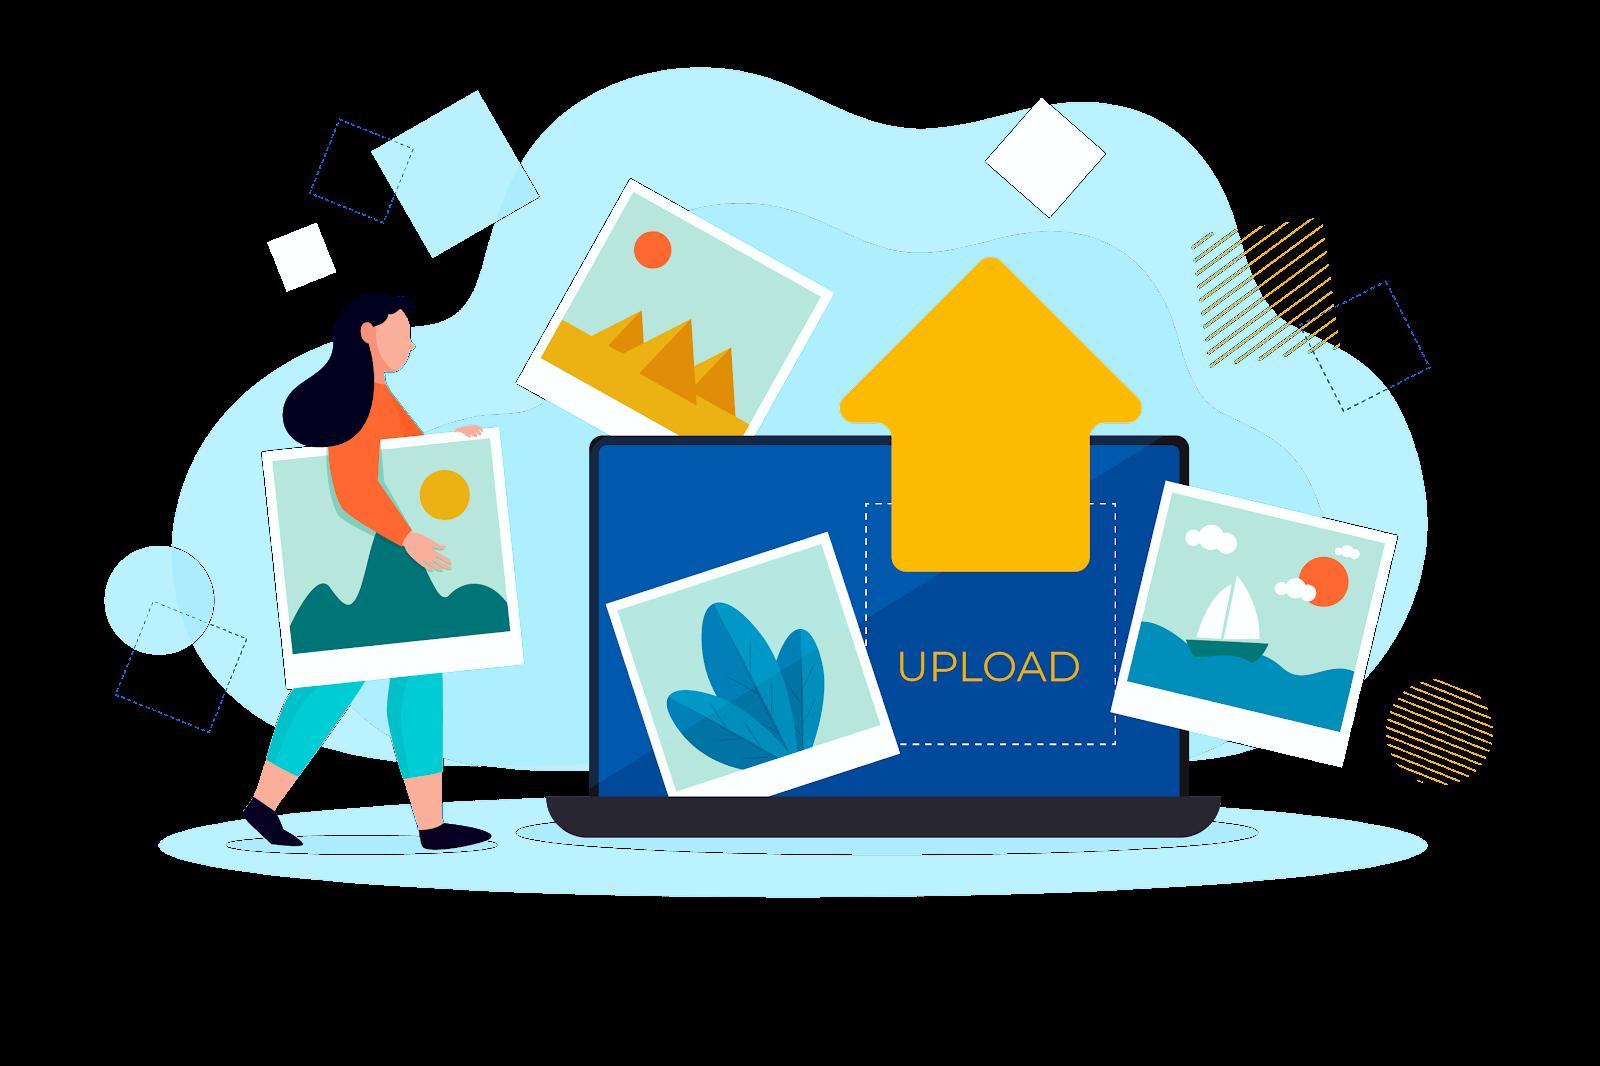 LifeCloud Review 2-IN-1 Cloud Storage & Drive App